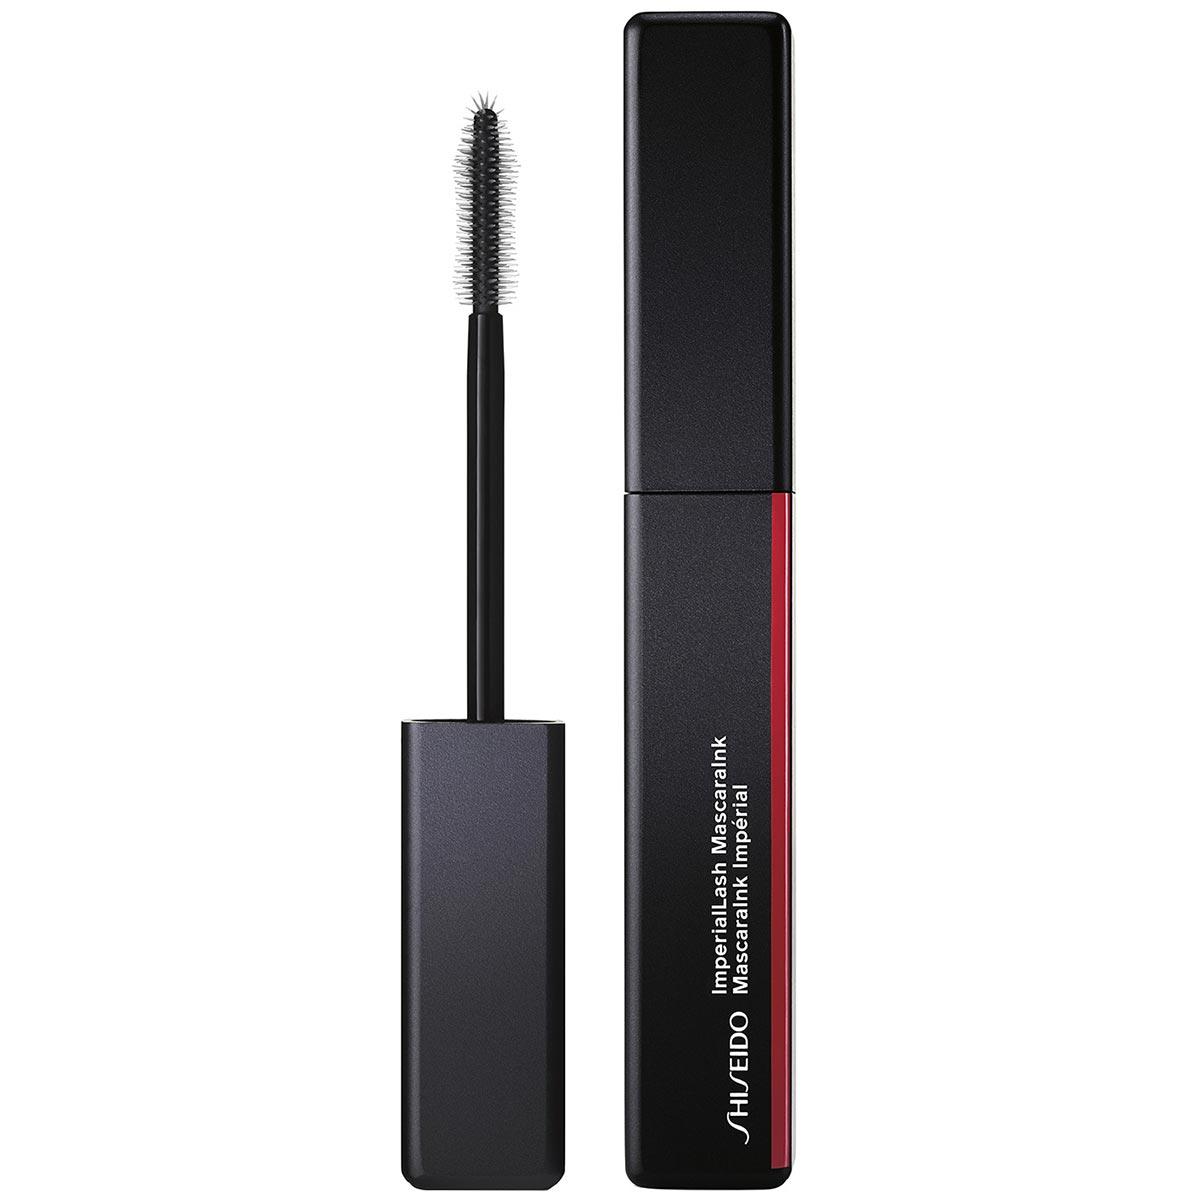 Shiseido - MascaraInk Impérial